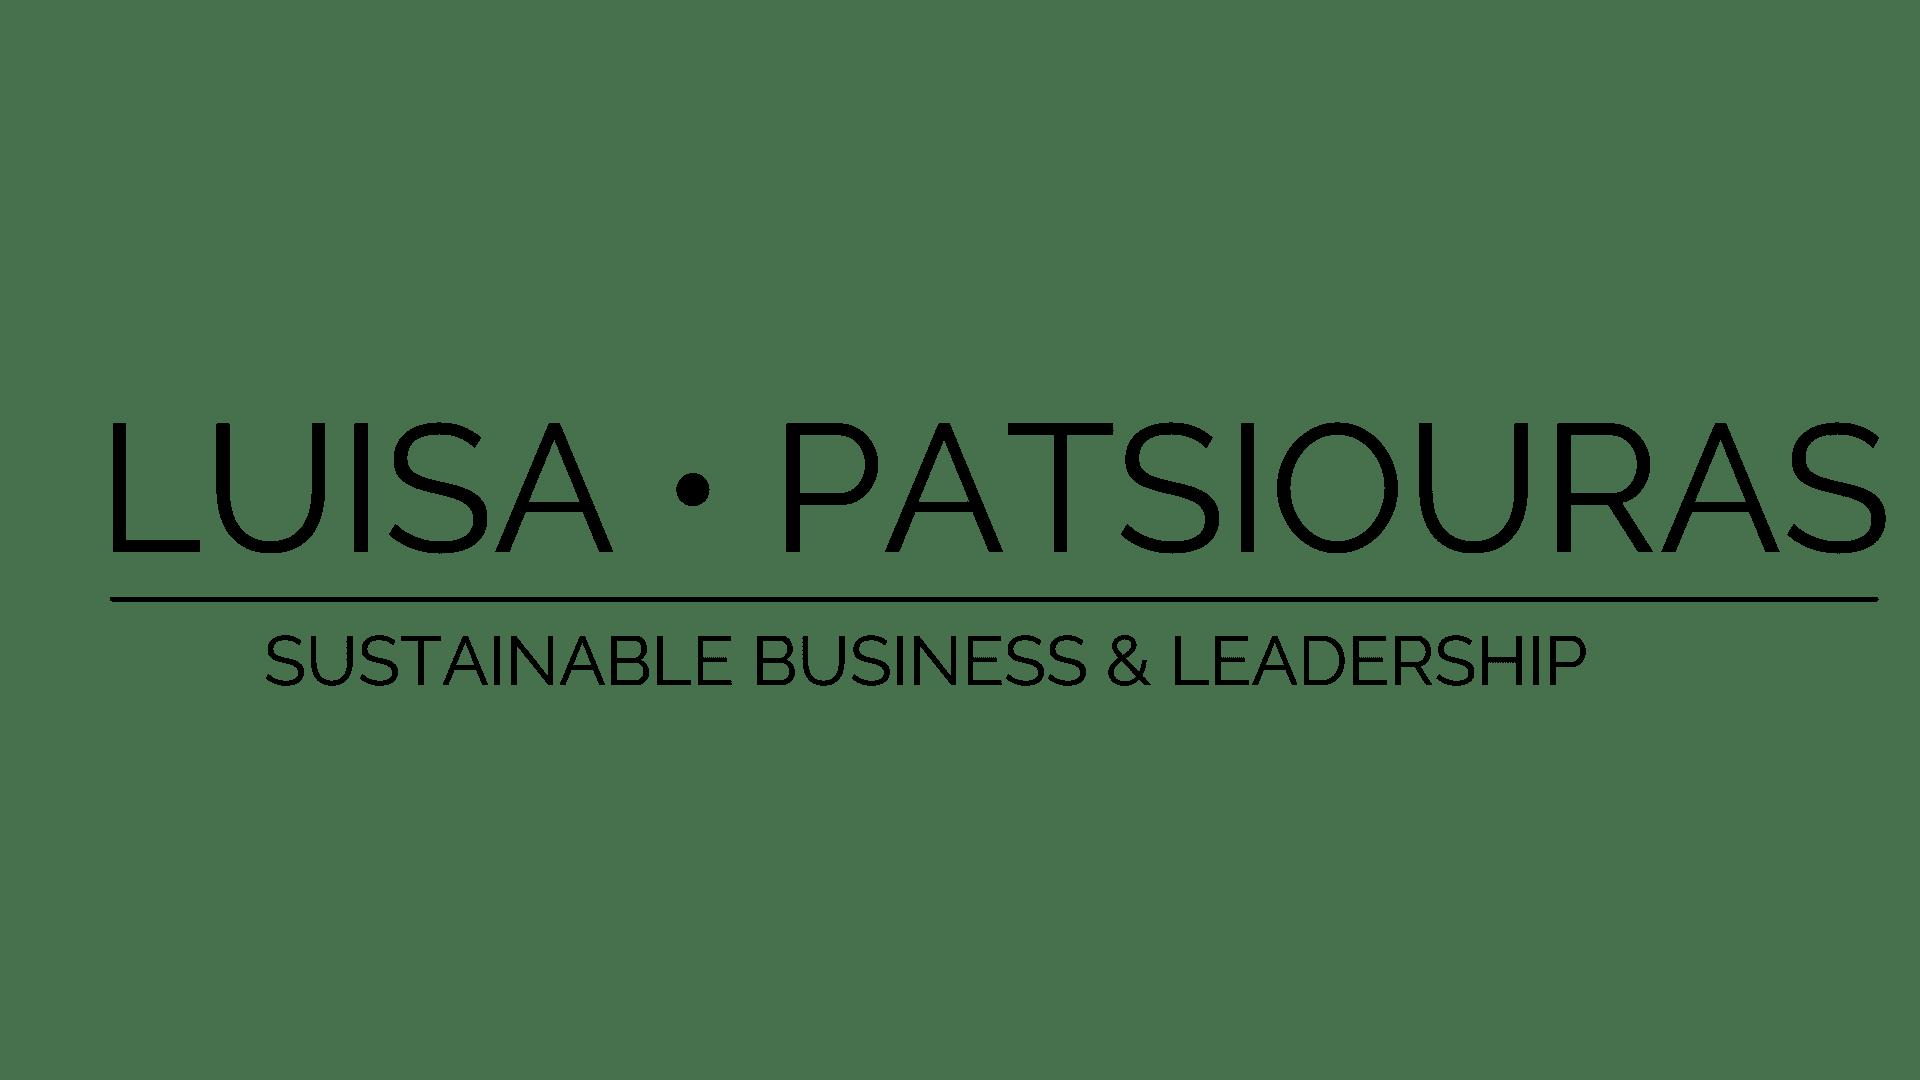 Luisa Patsiouras